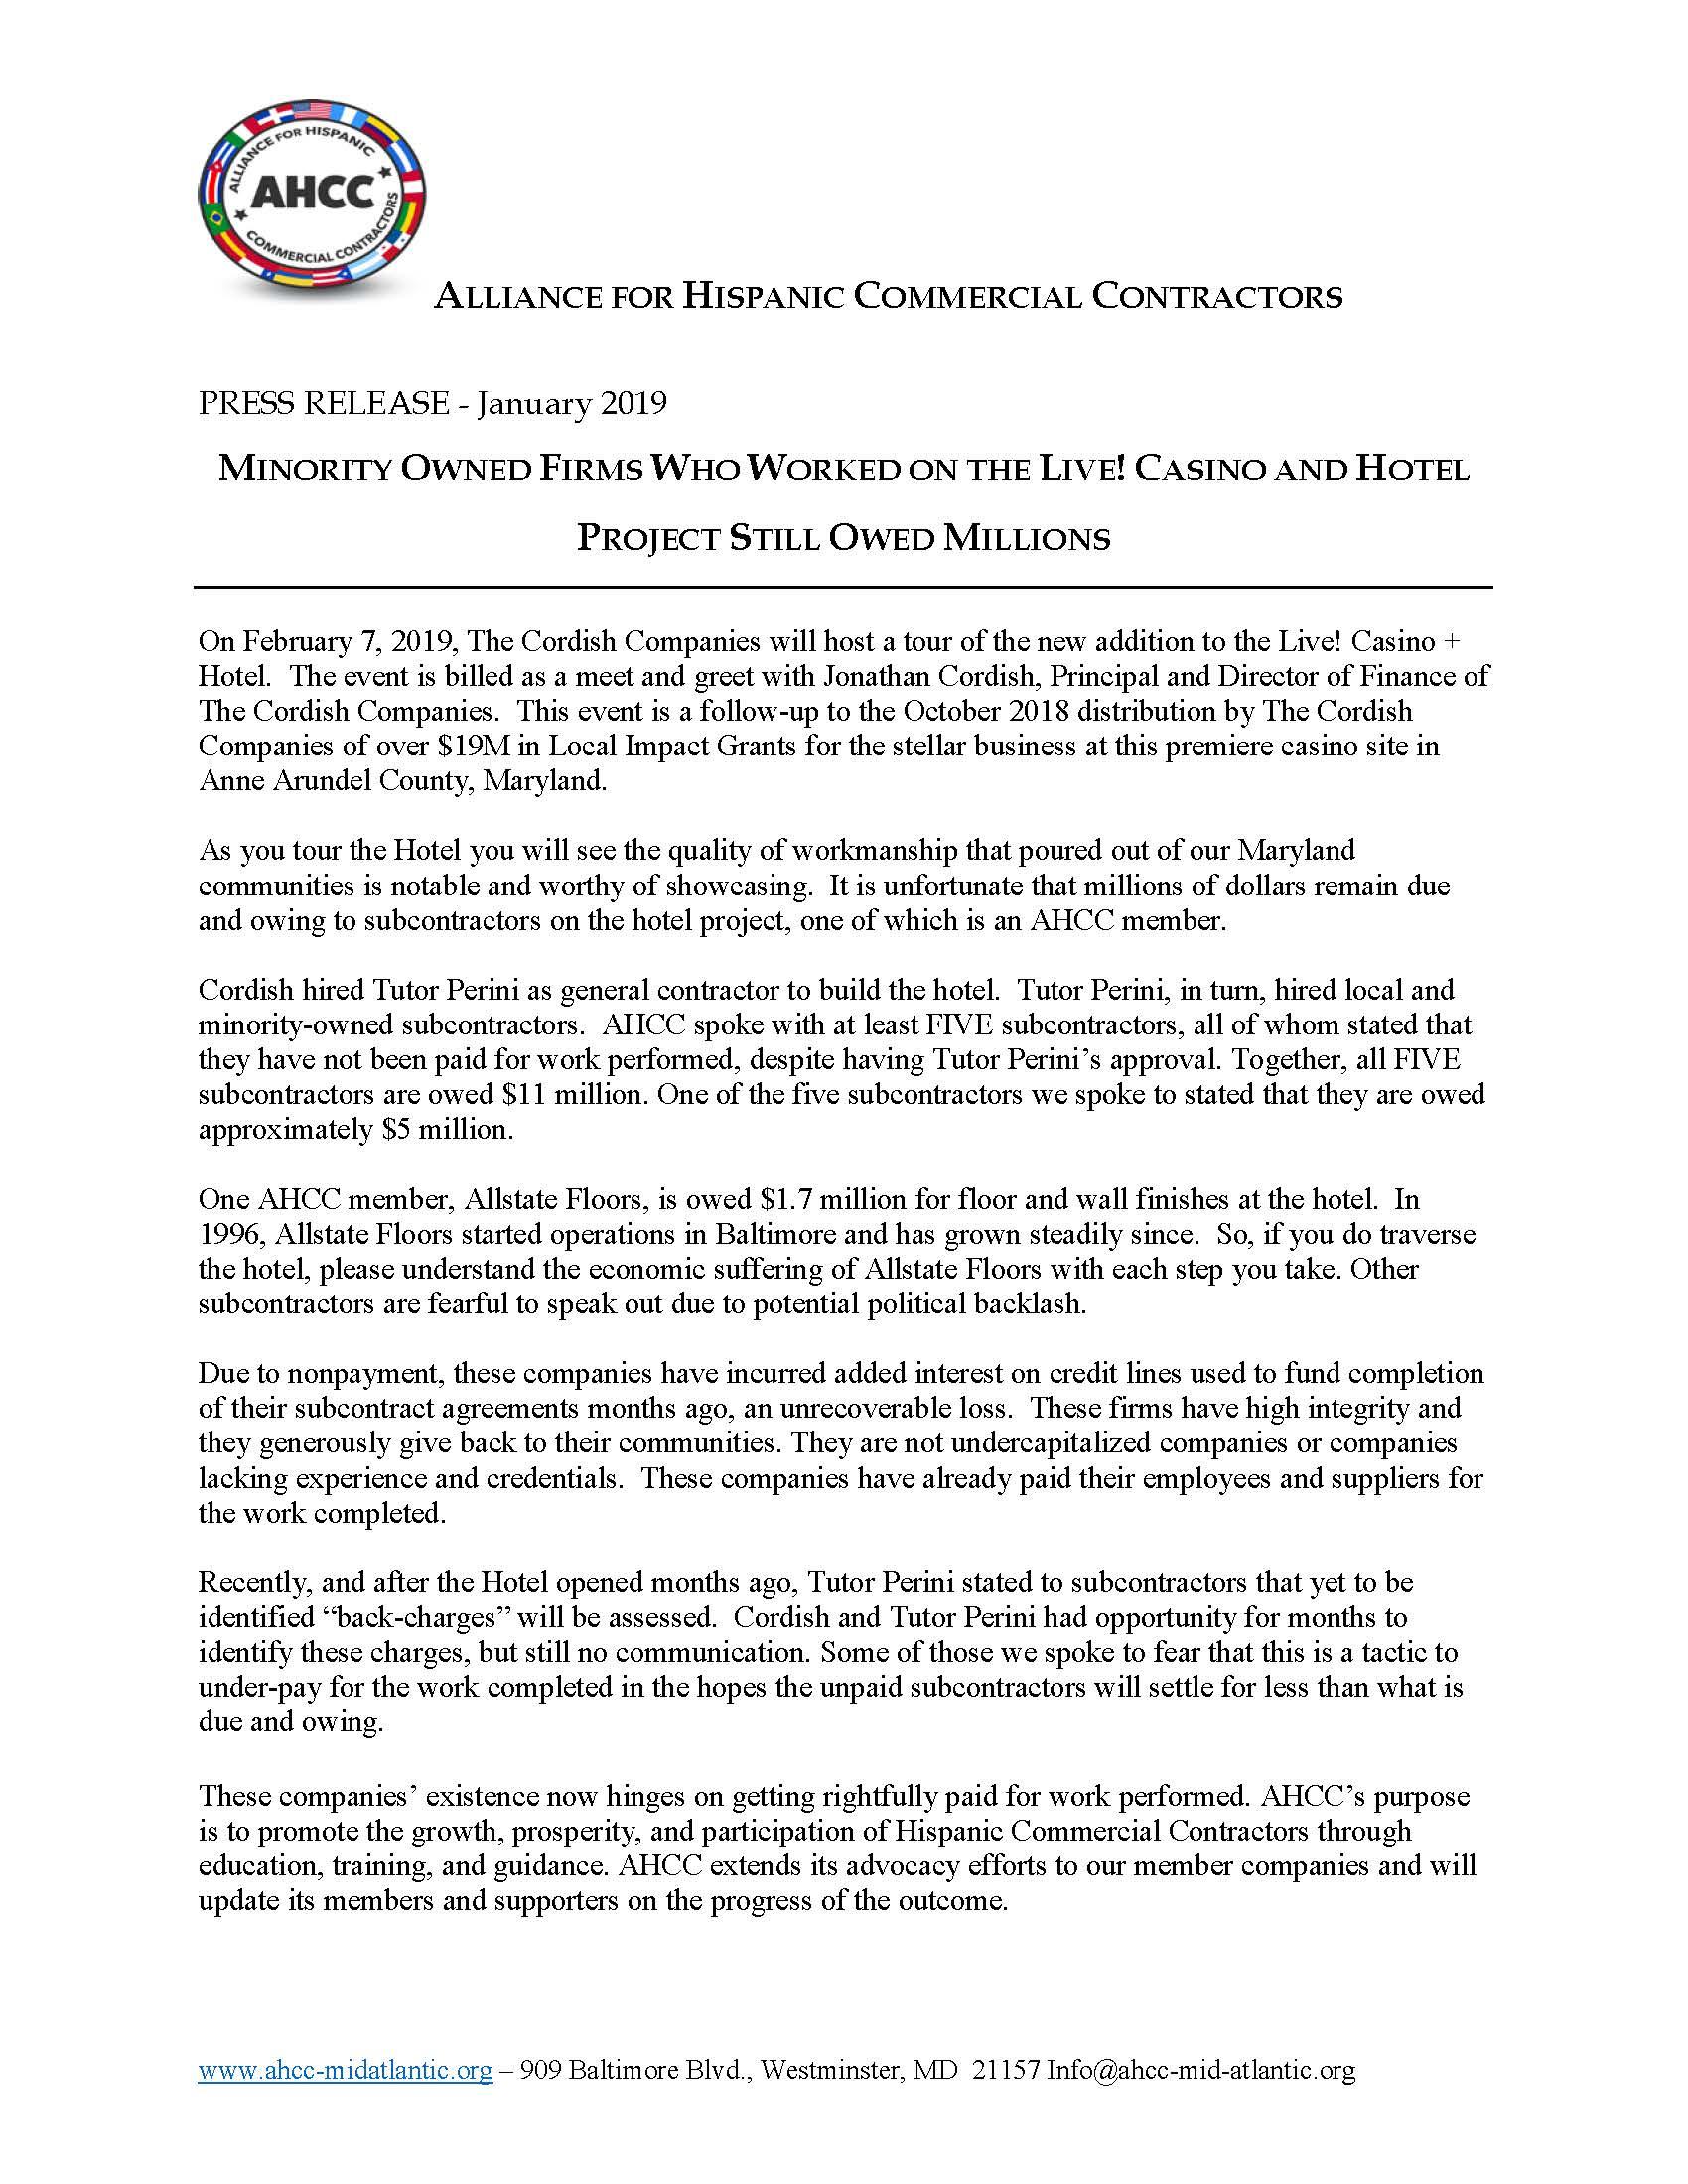 PRESS RELEASE Allstate Floors re Casino Final - AHCC